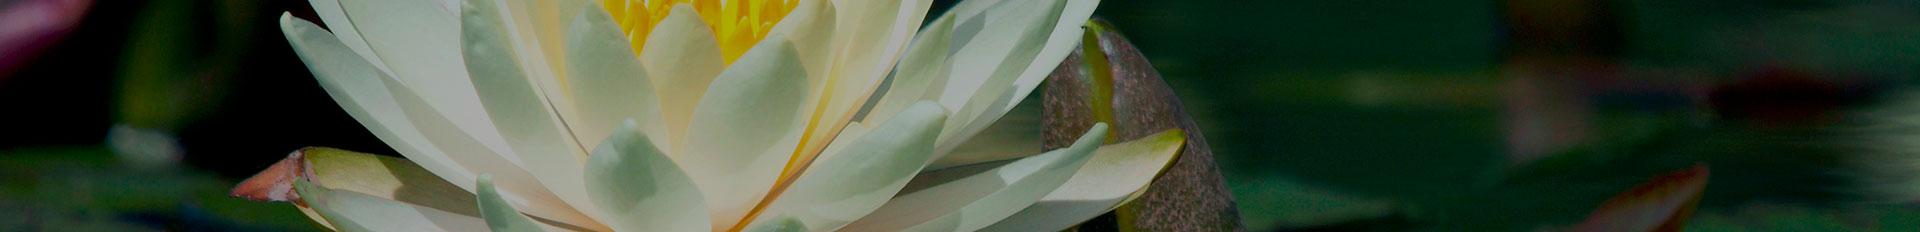 Resources | Gorgen Funeral Services